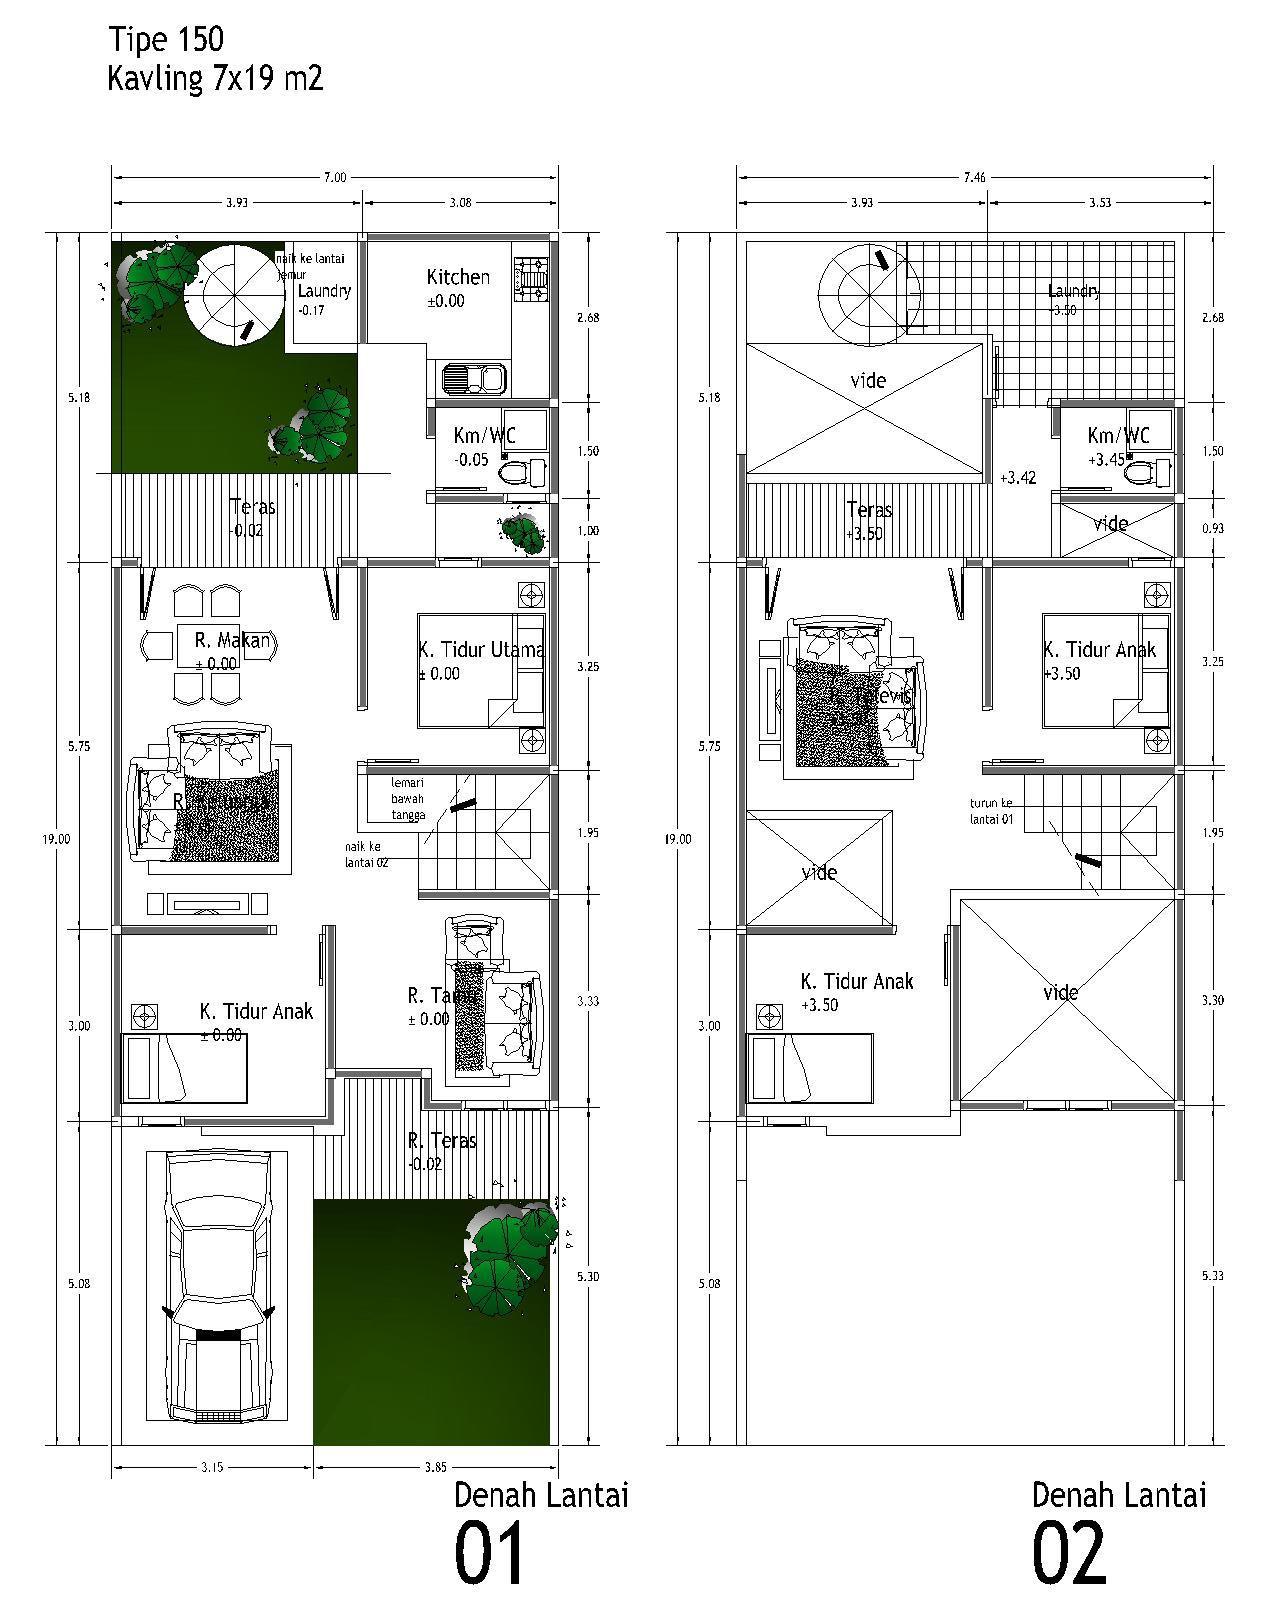 99 Contoh Gambar Denah Rumah Minimalis Terlengkap Terbaru